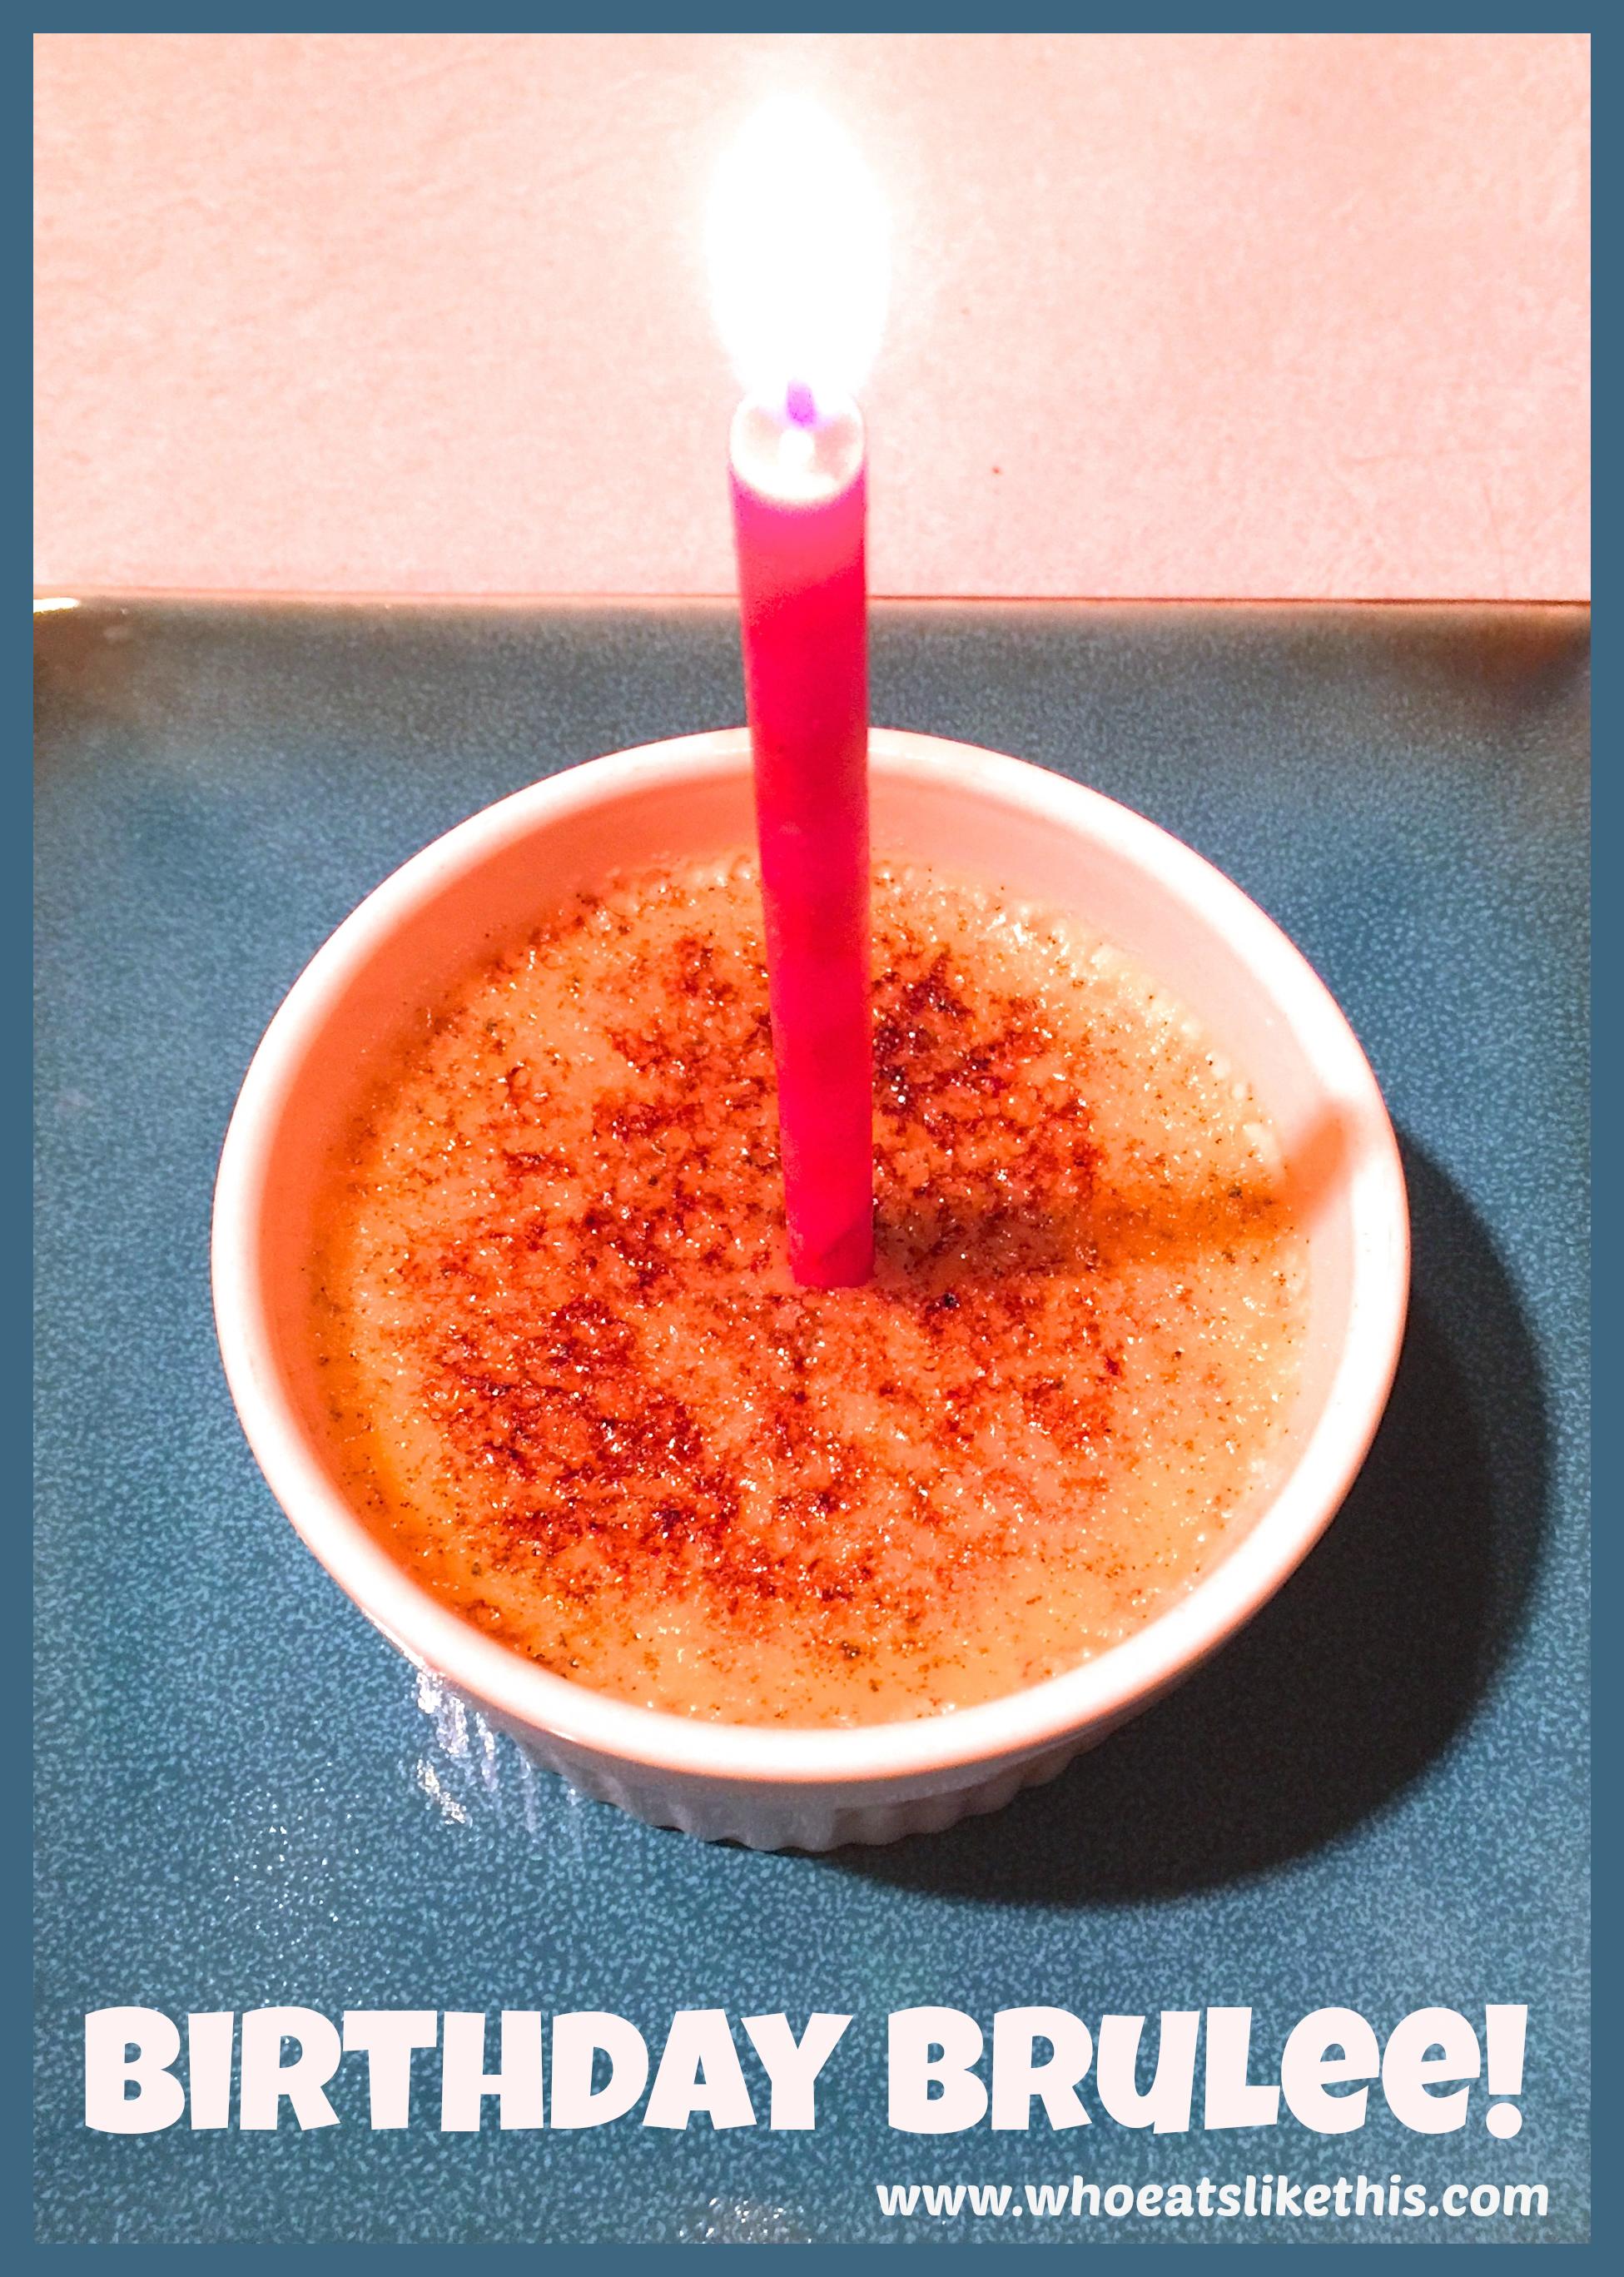 Birthday Brûlée!